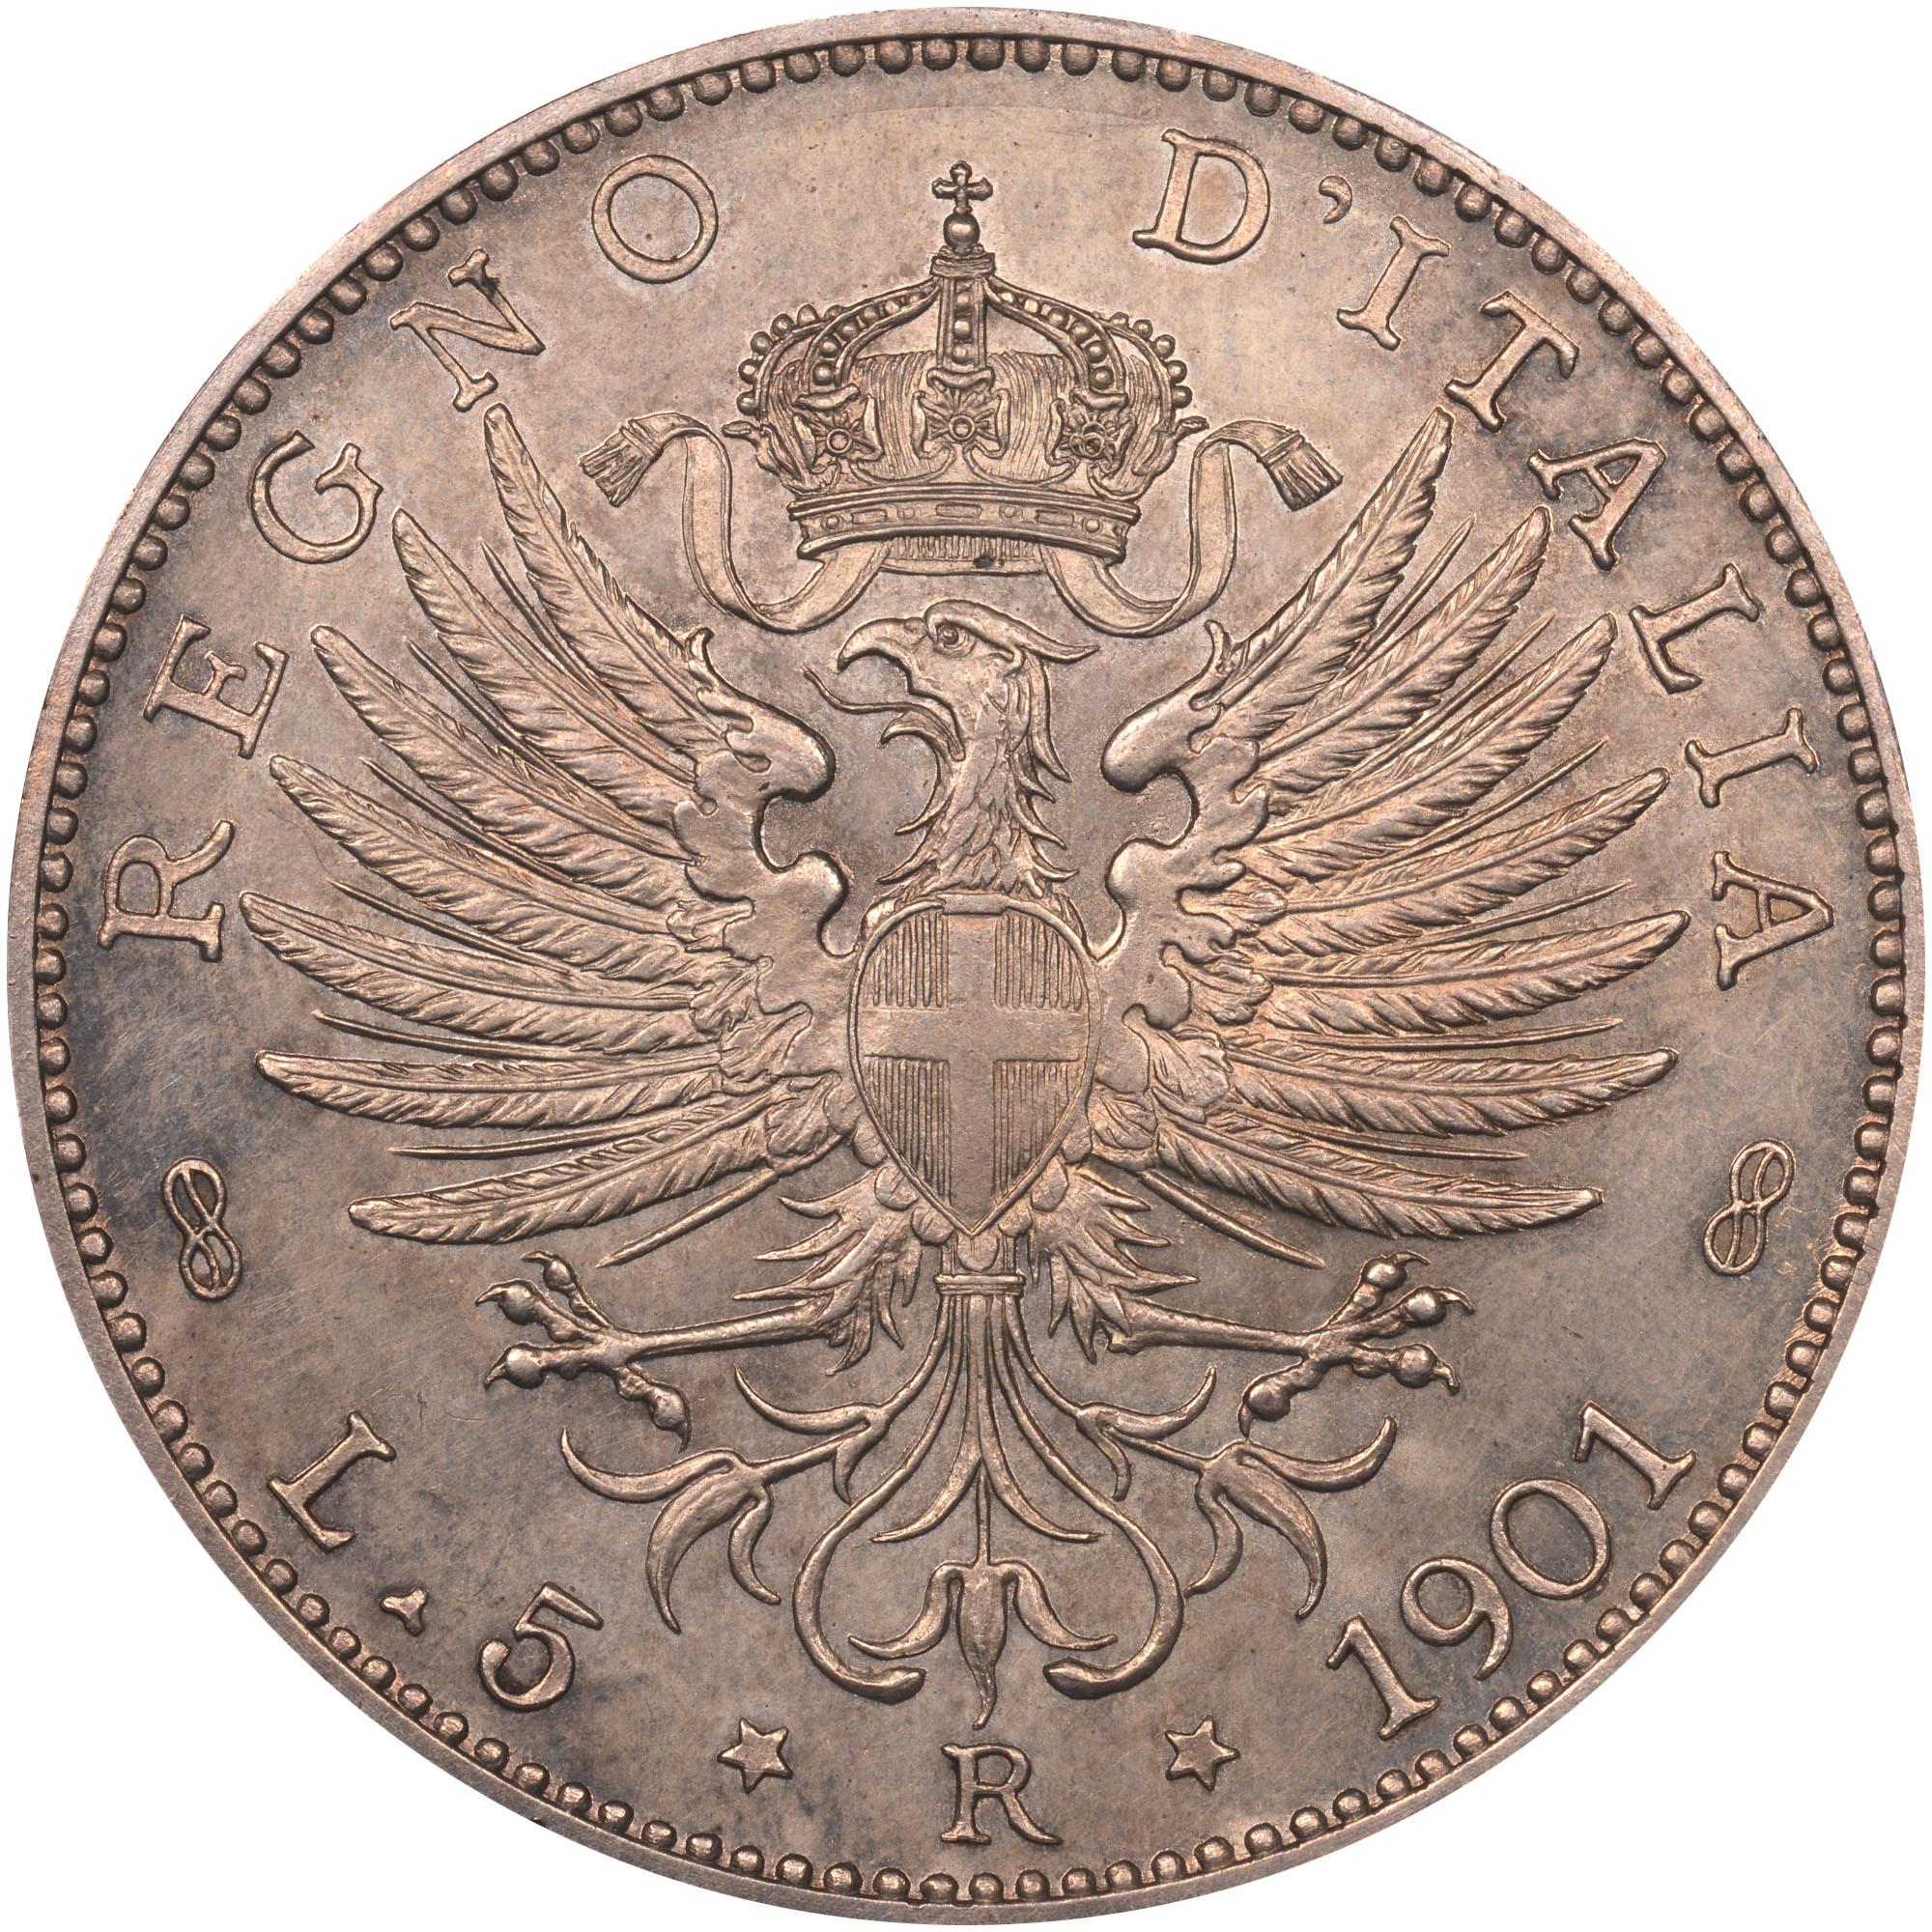 1901 Italy 5 Lire reverse